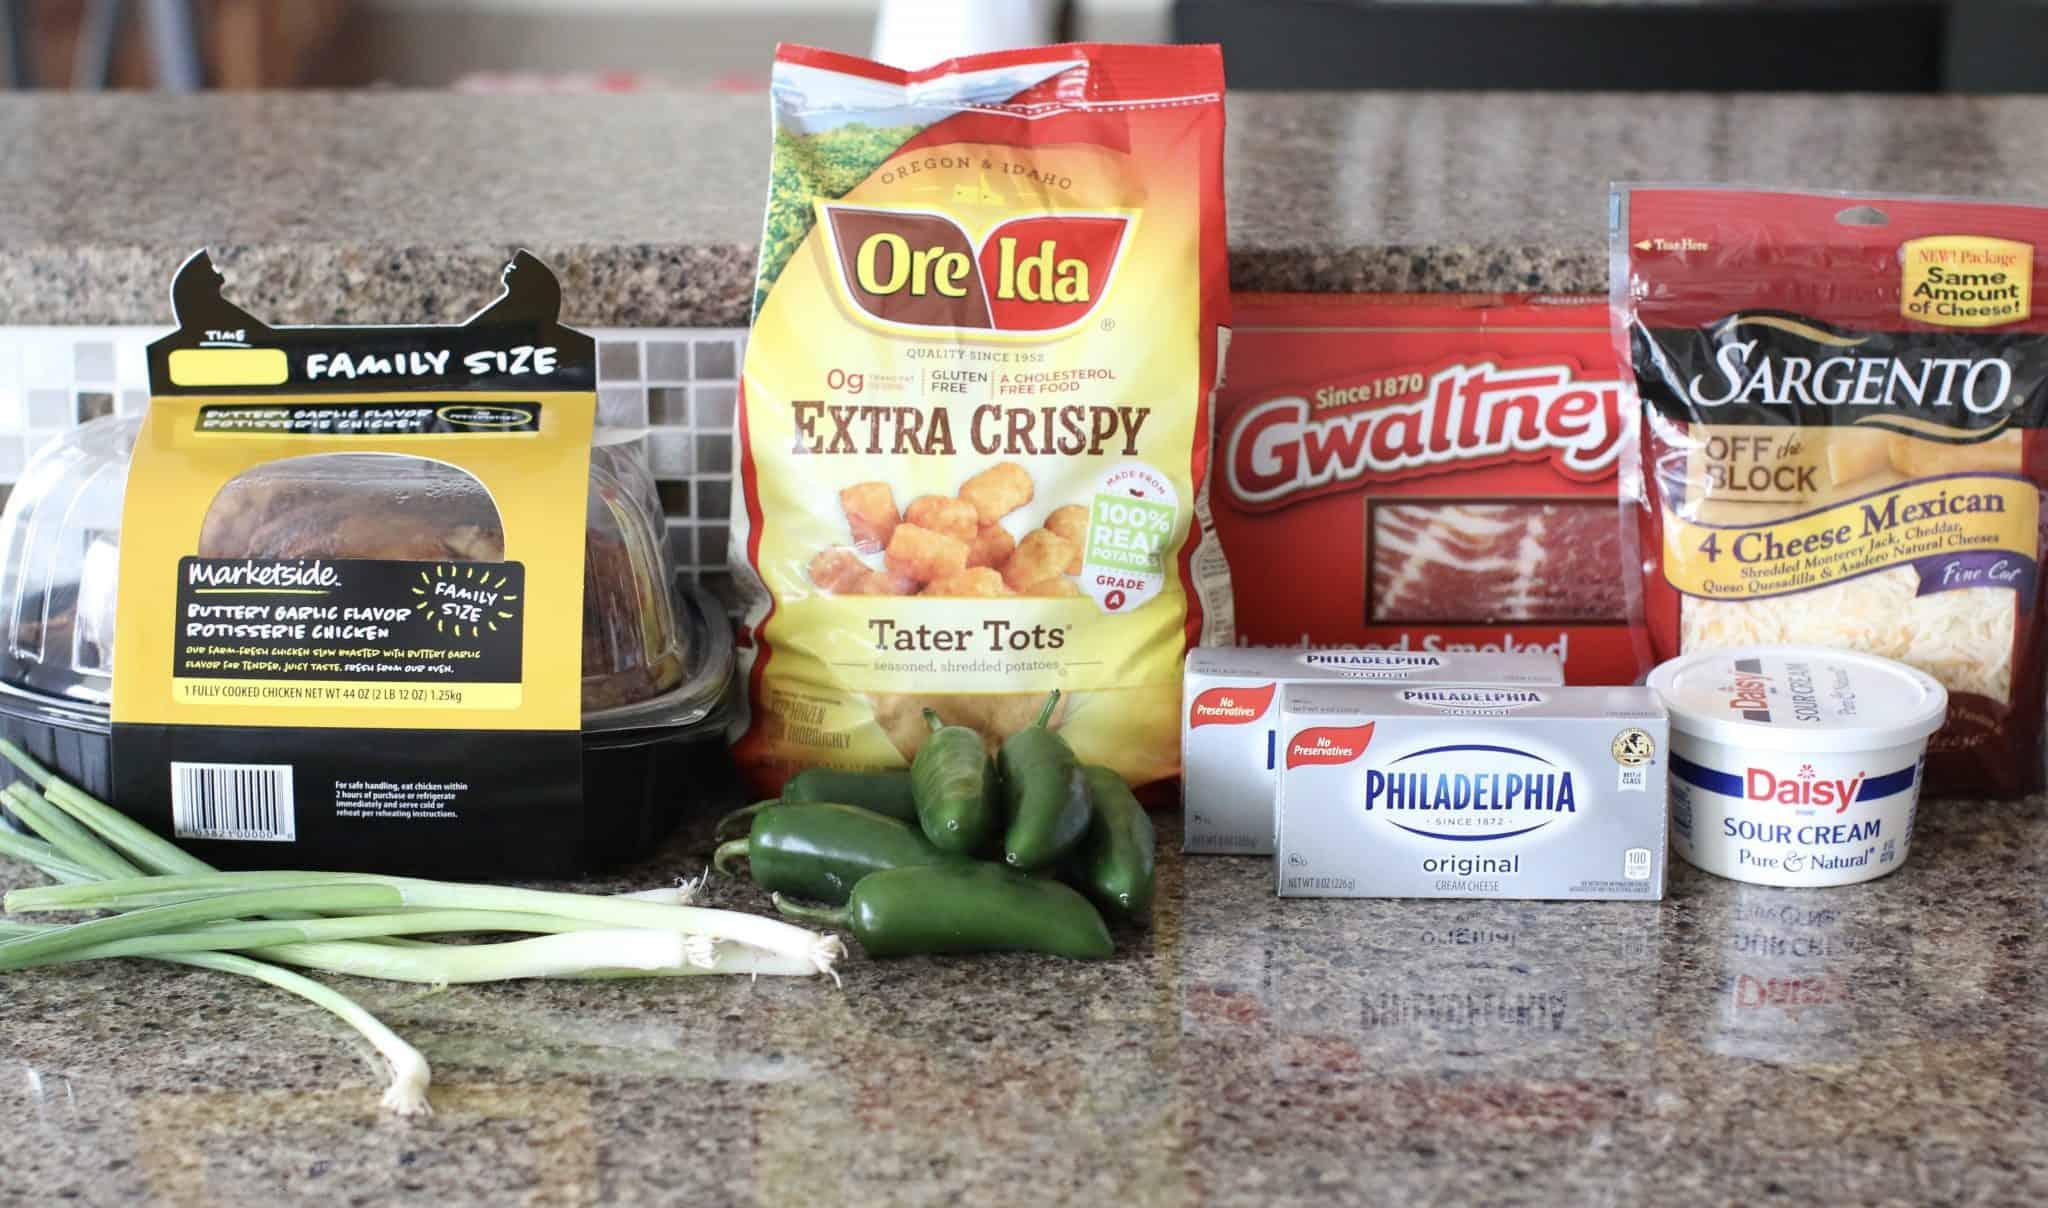 tater tots, cream cheese, sour cream, garlic salt, black pepper, Mexican shredded cheese, green onions, jalapeño pepper, bacon, rotisserie chicken.